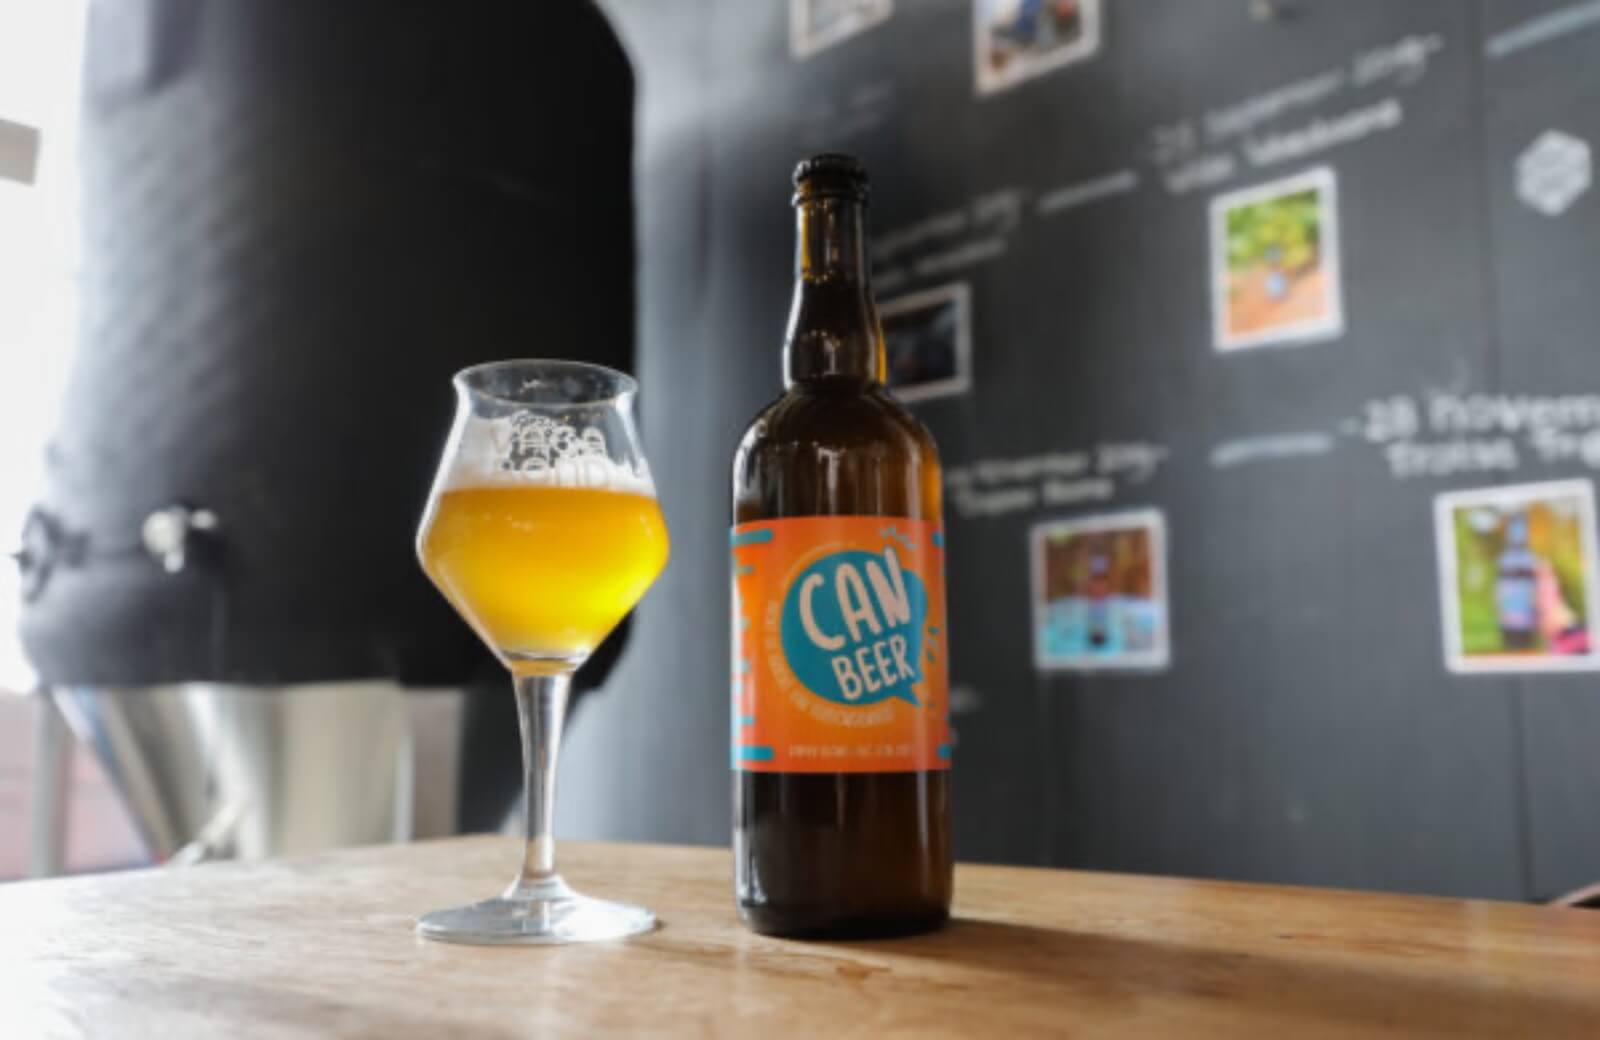 CAN Beer fles + glas